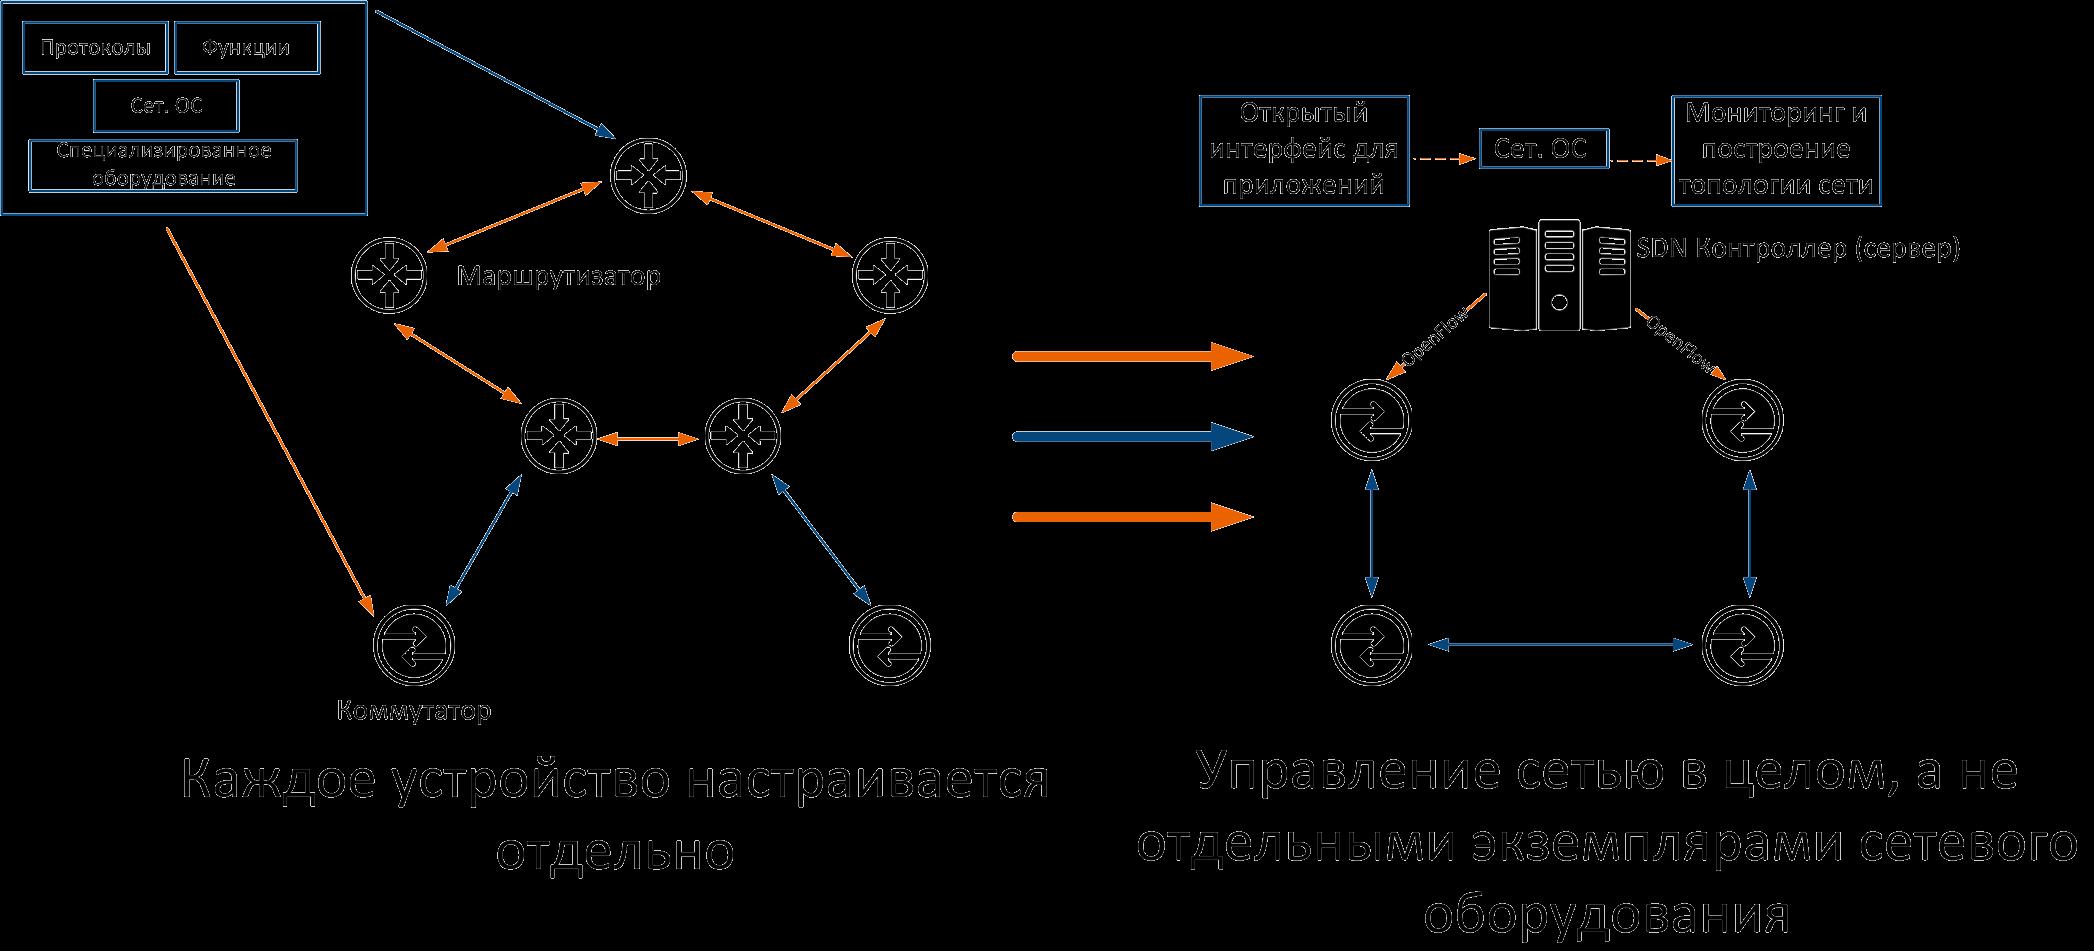 SDN сети